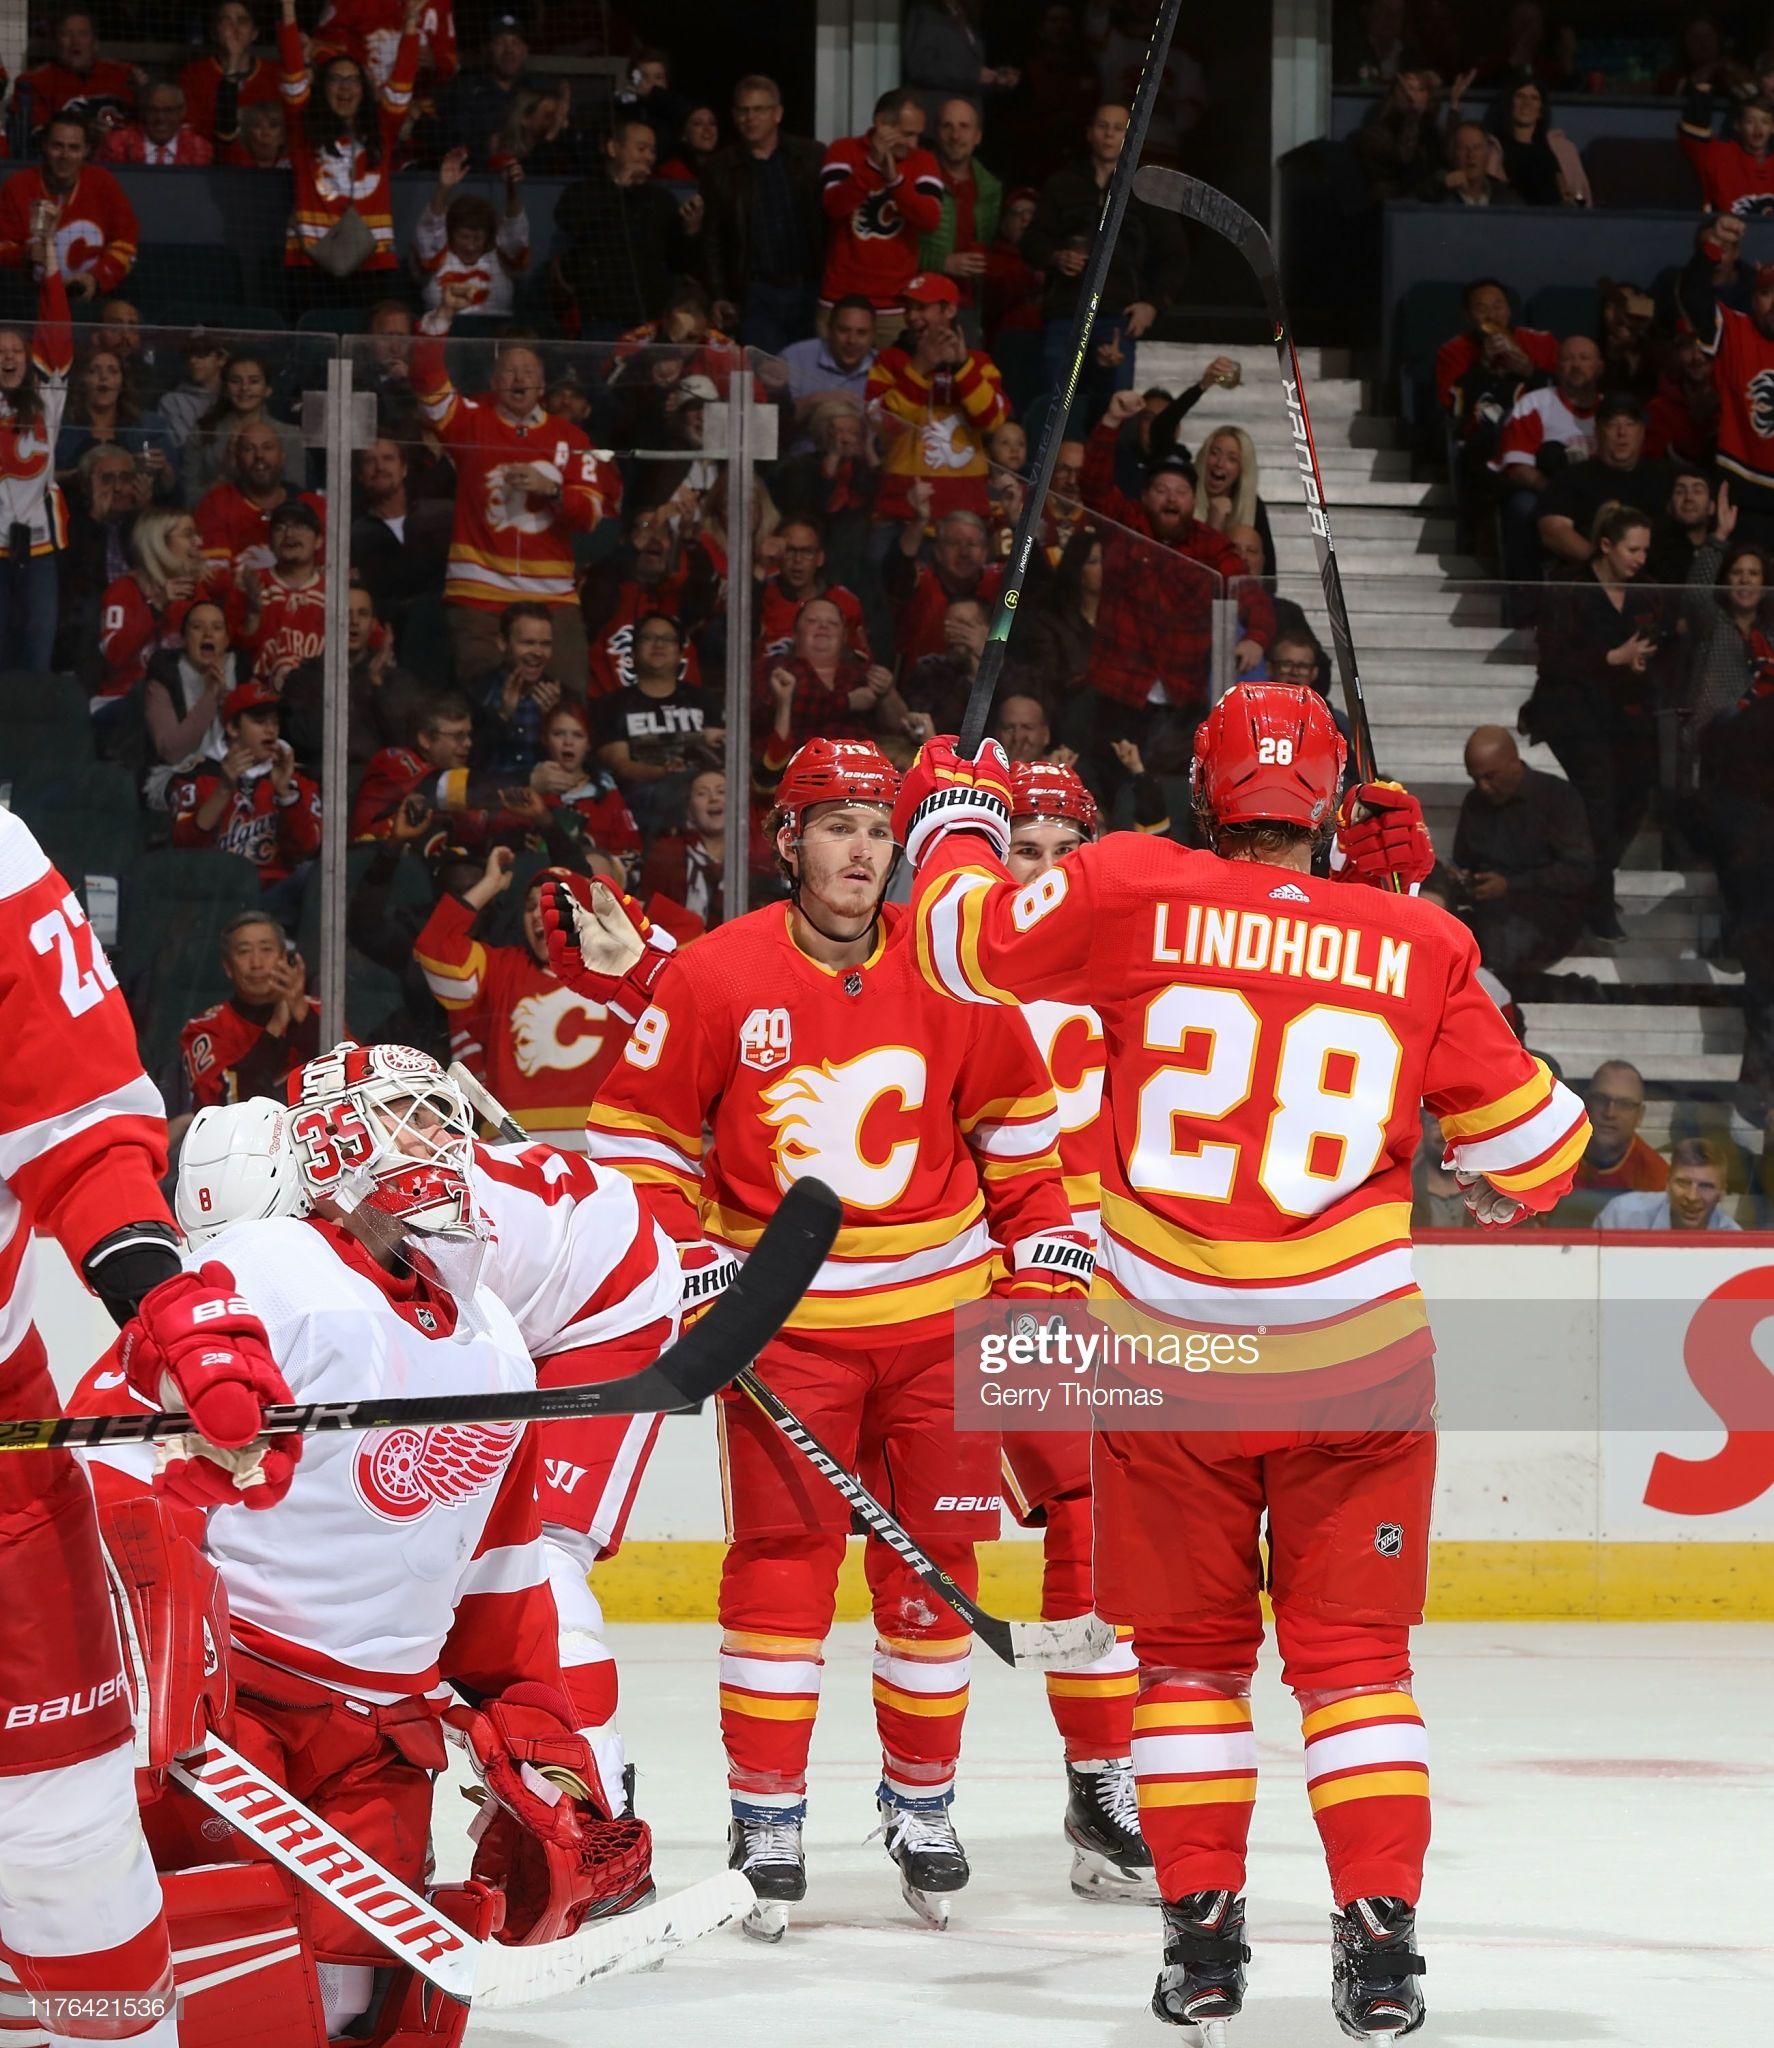 Elias Lindholm Of The Calgary Flames Celebrates After A Goal Against In 2020 Calgary Flames Calgary Detroit Red Wings